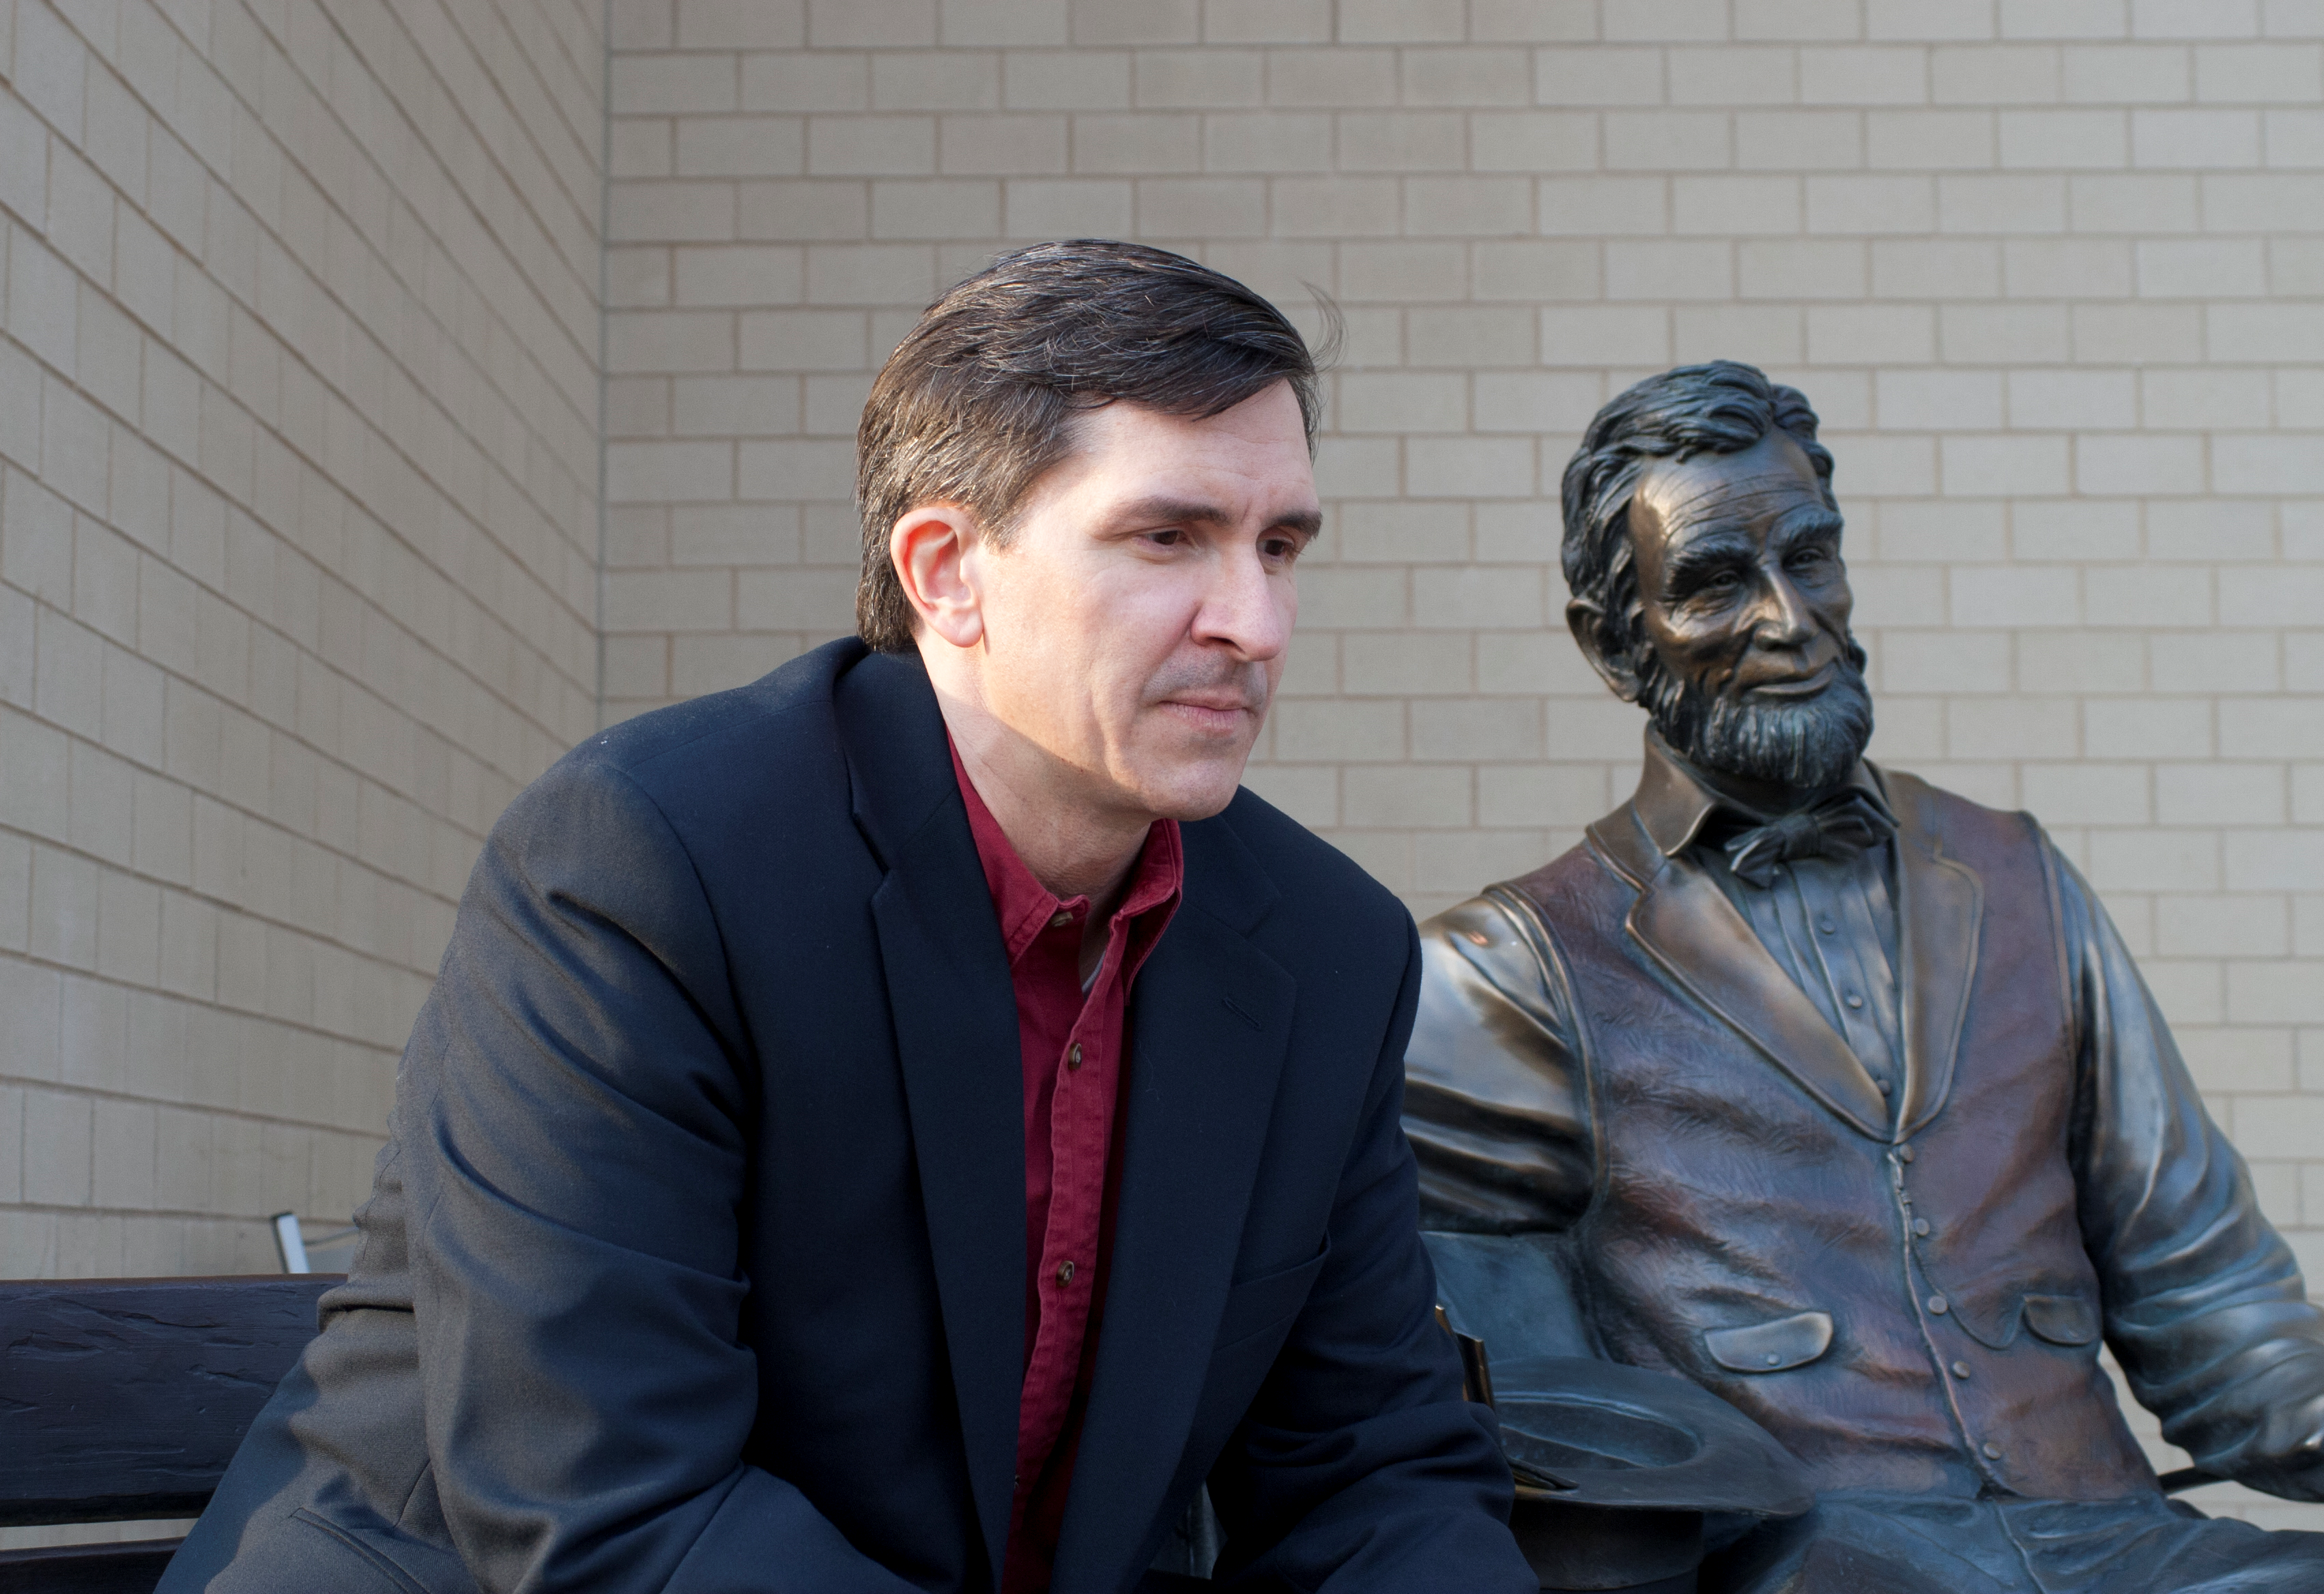 Nebraska Senate Candidate Says Sasse's 'Naive Aggression' Could Lead to War